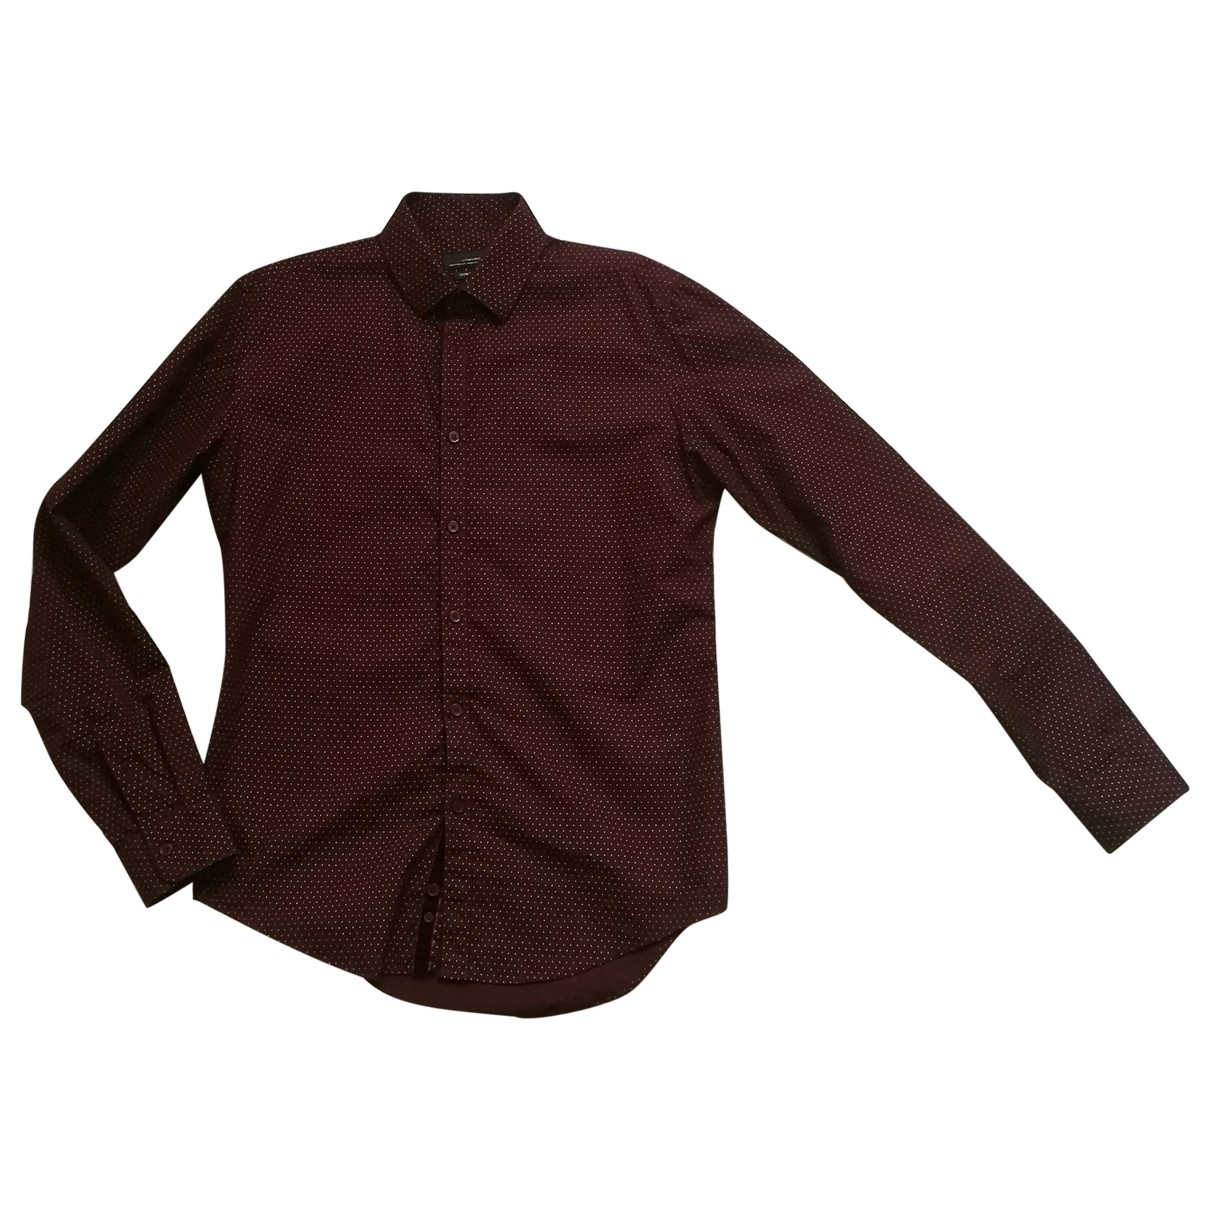 Zara \N Burgundy Cotton Shirts for Men M International